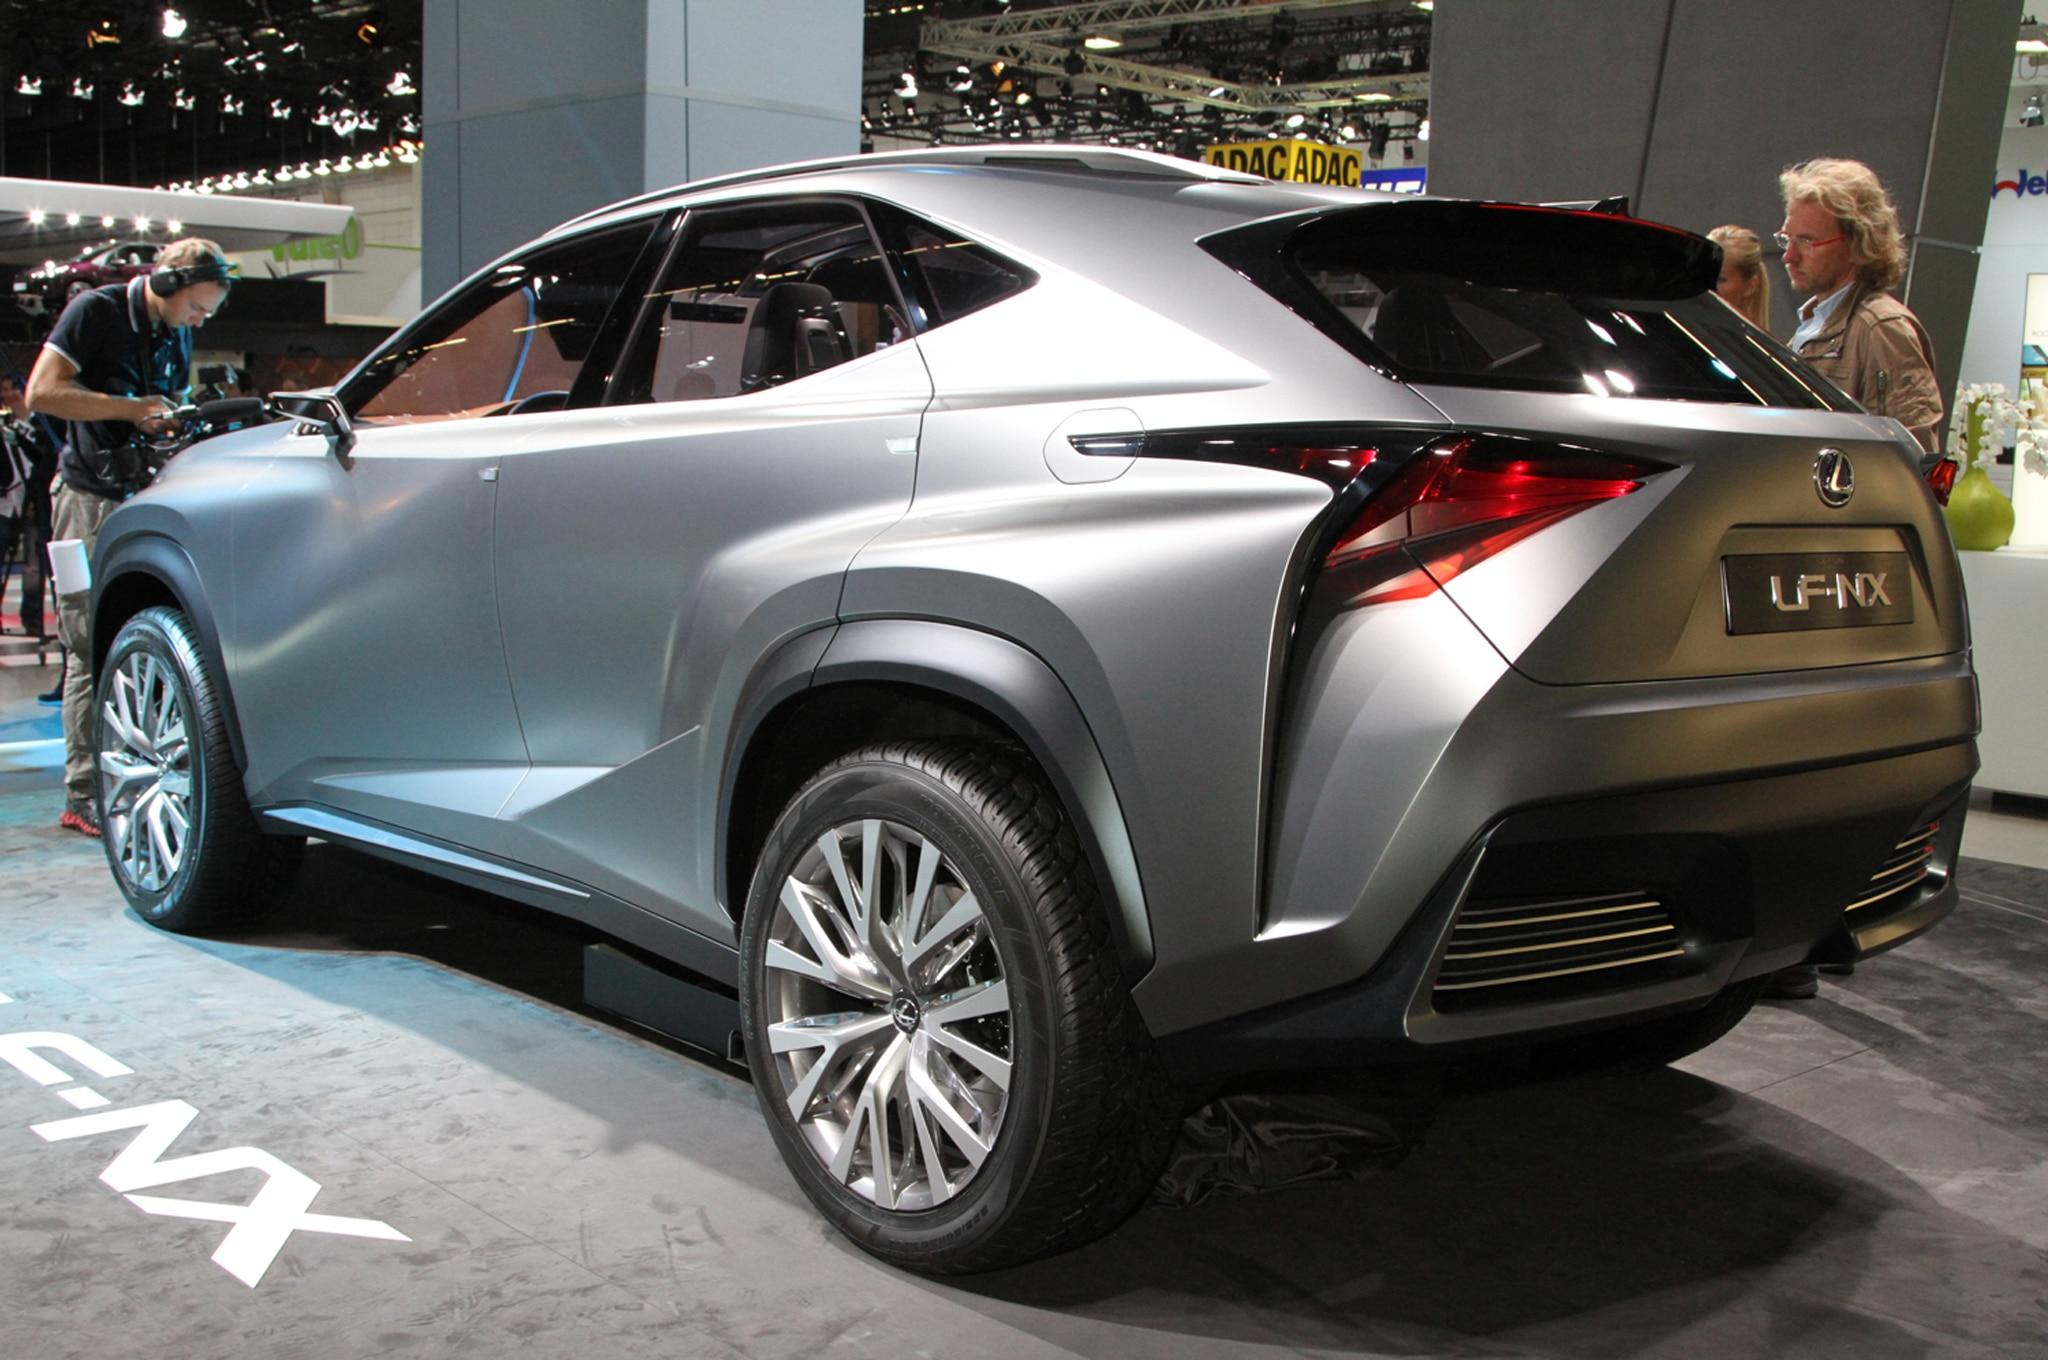 Lexus Lf Nx >> Lexus LF-NX Concept First Look - Automobile Magazine